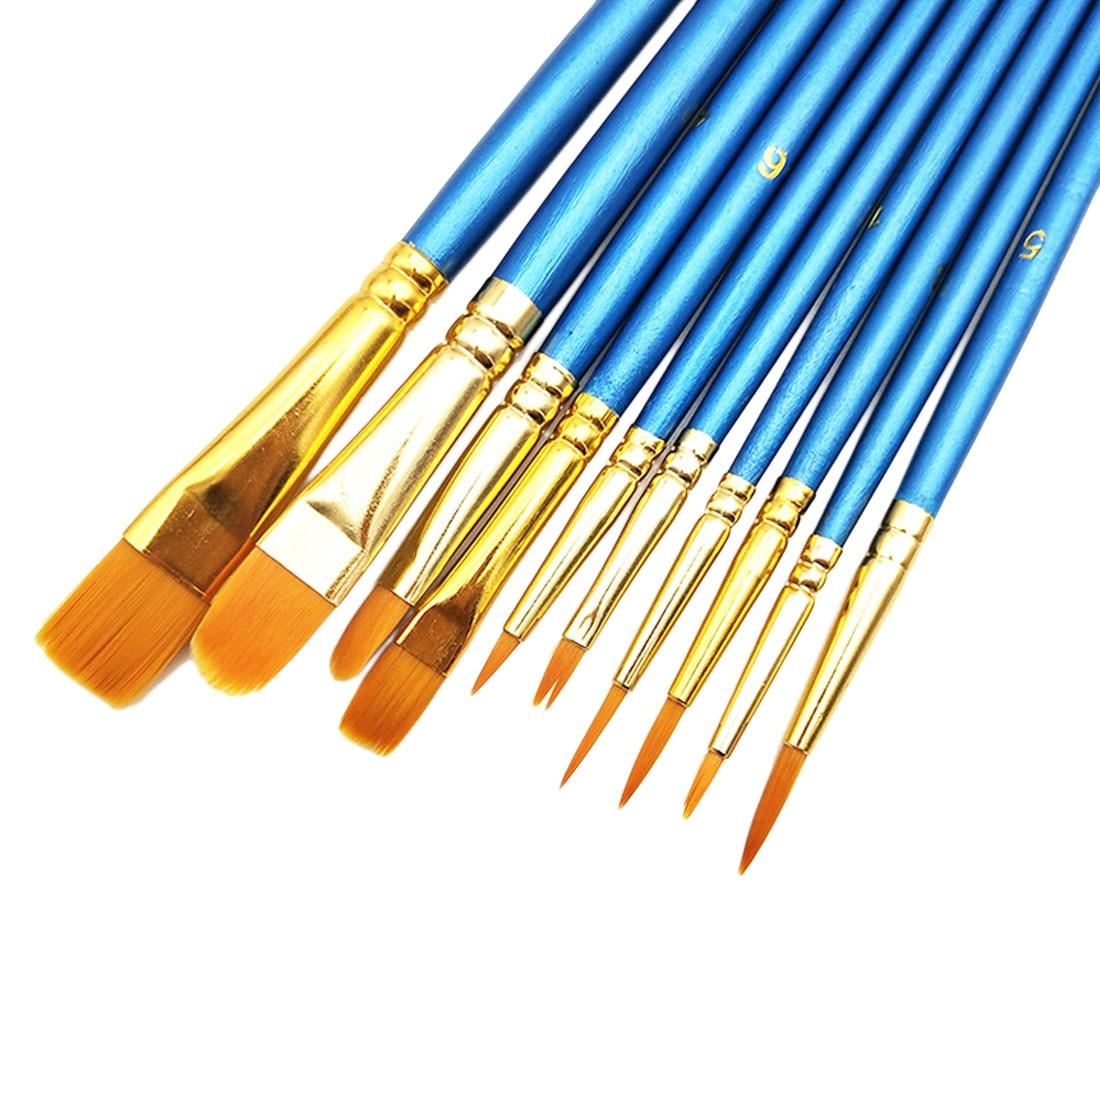 10 unids/set Nylon pincel para óleo alrededor de la pintura cepillo para acuarela aceite acrílico cepillo pluma pincel de mango de madera dibujo arte suministros